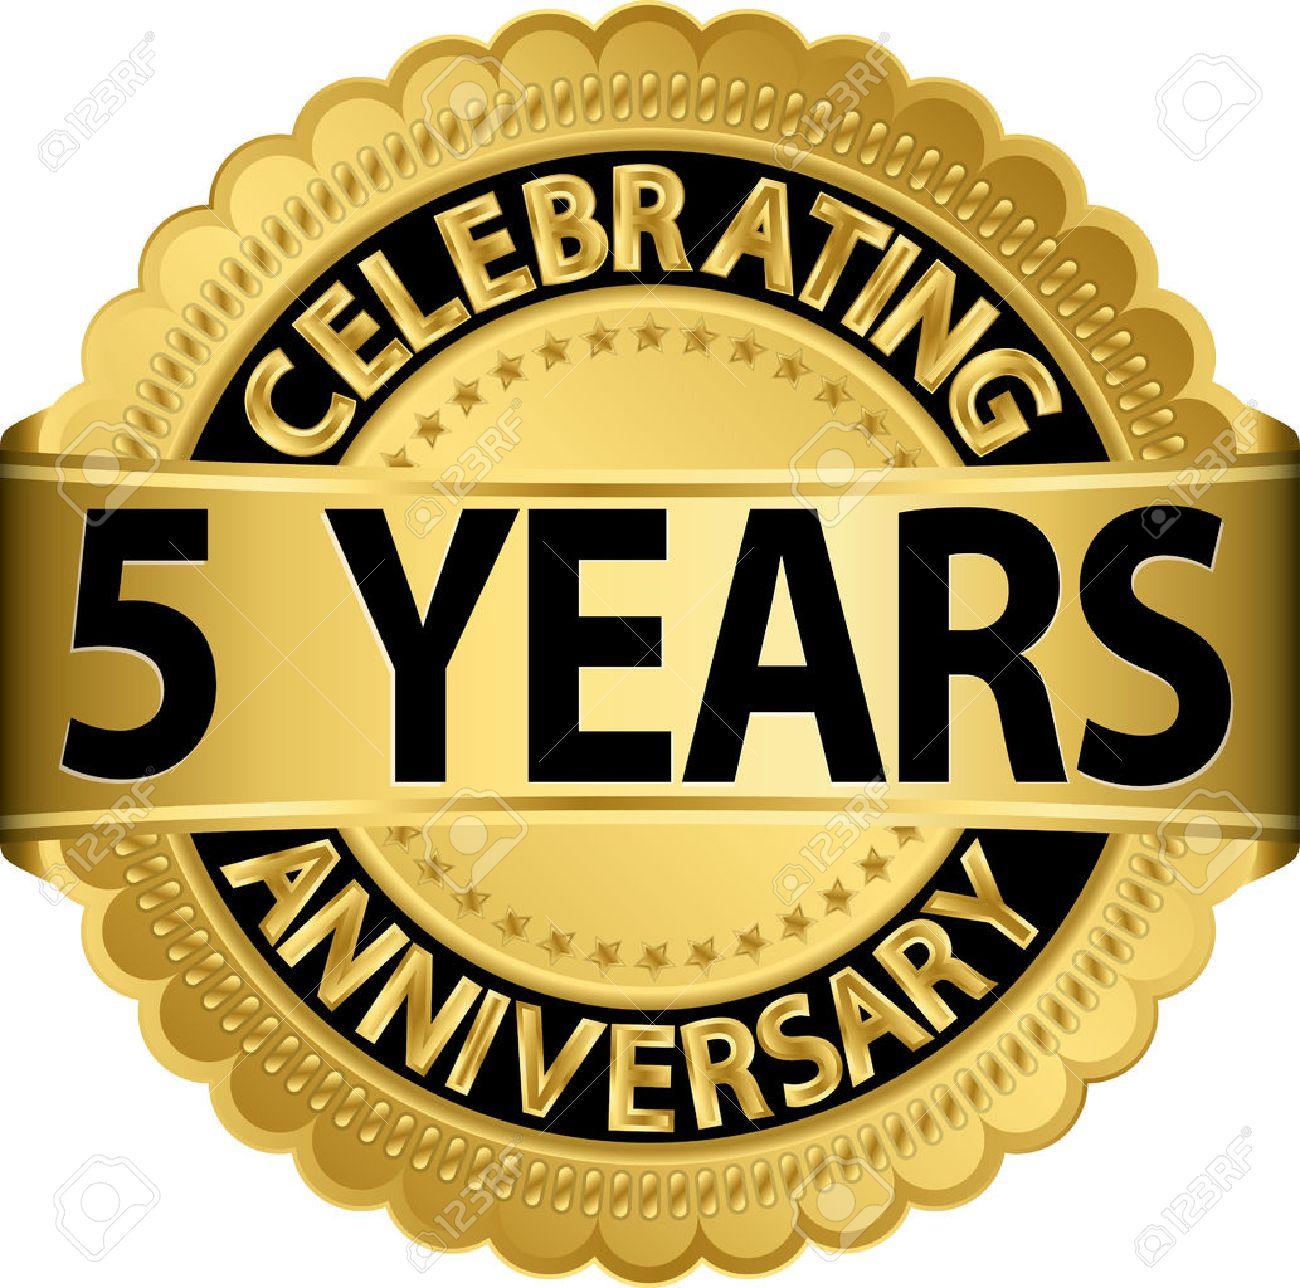 Celebrating 5 years anniversary golden label with ribbon vector celebrating 5 years anniversary golden label with ribbon vector illustration stock vector 25041869 biocorpaavc Choice Image